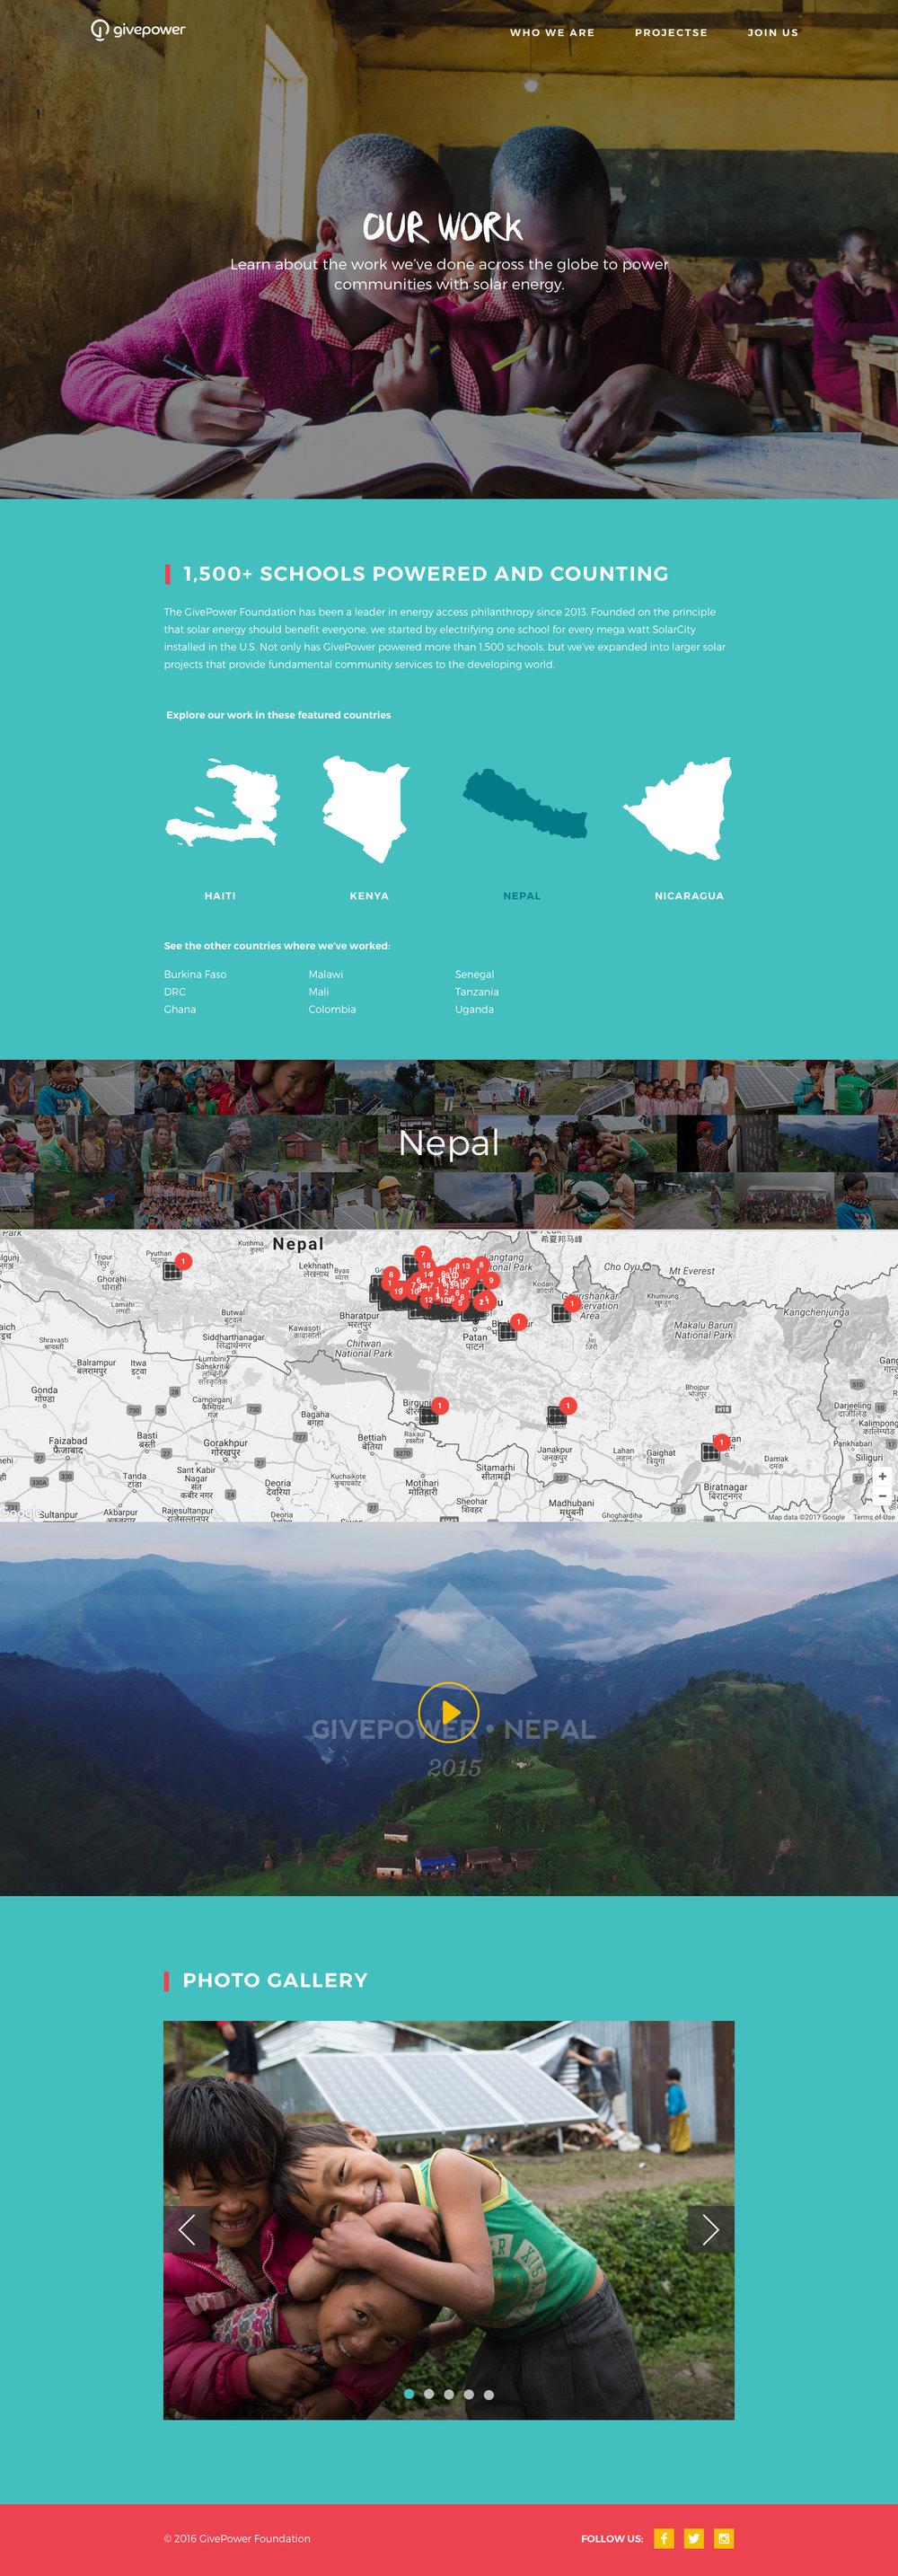 02 our work - nepal.jpg